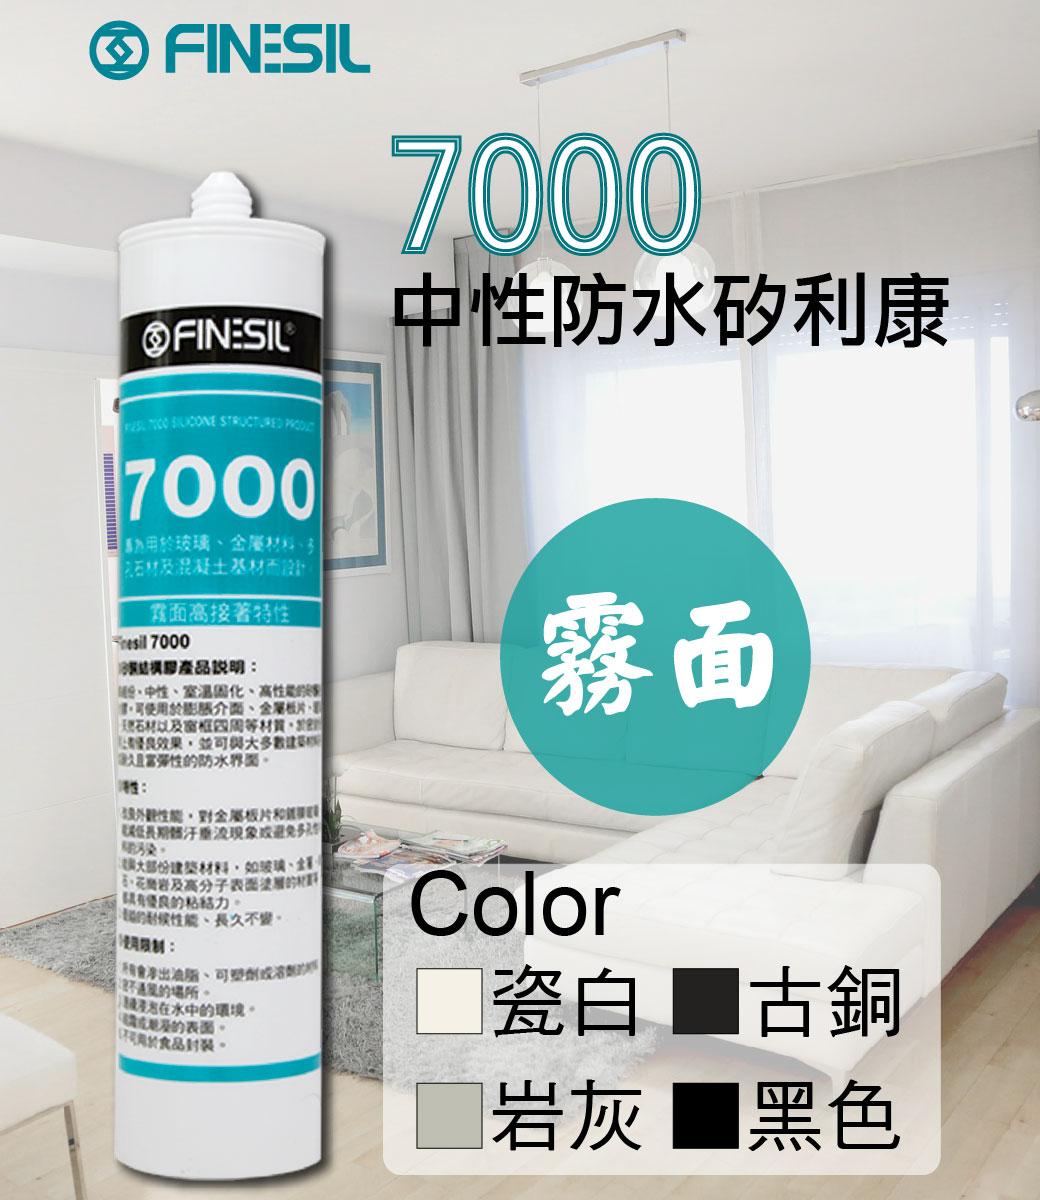 【FINESIL】7000霧面中性矽利康(全館現貨 火速出貨)